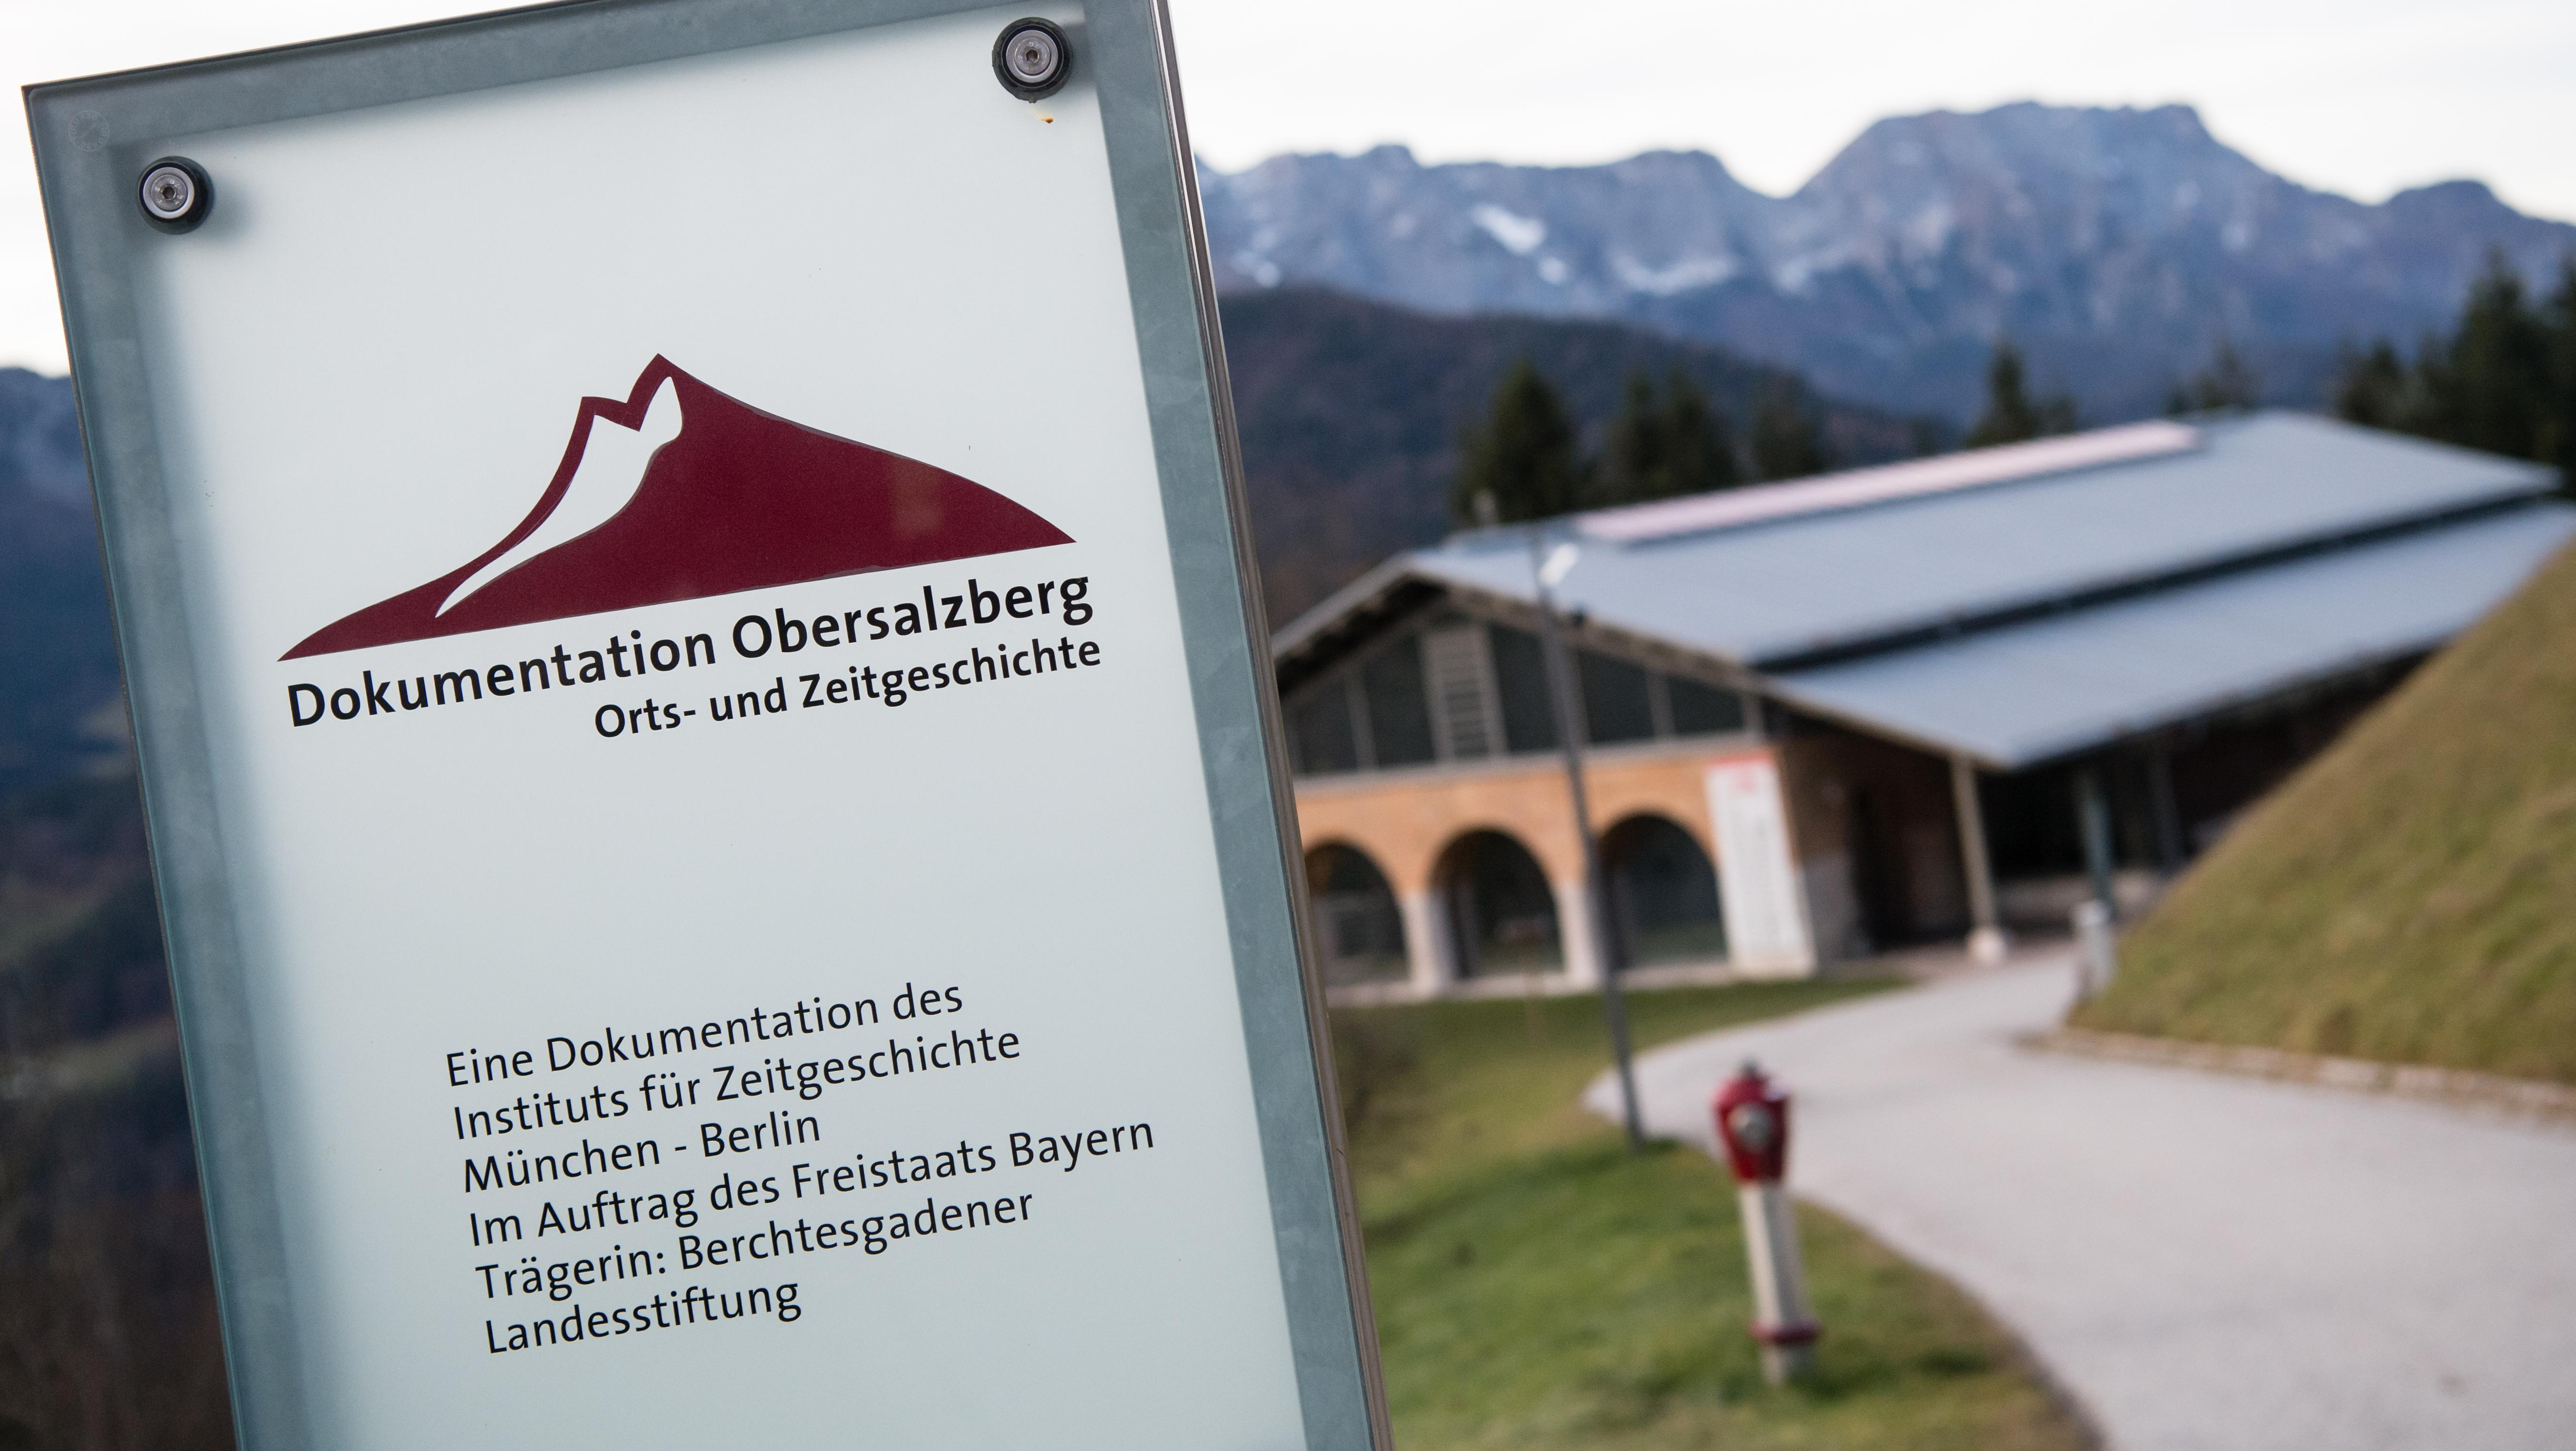 NS-Dokumentationszentrum Obersalzberg